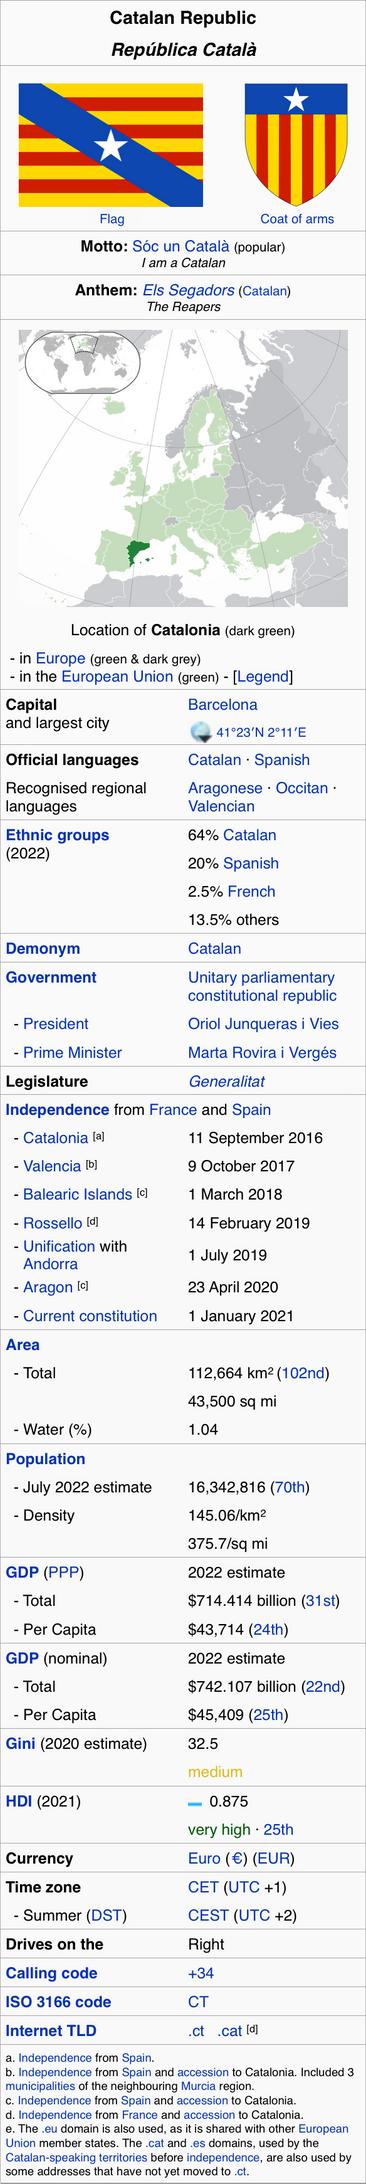 Catalonia Info-Box by HouseOfHesse